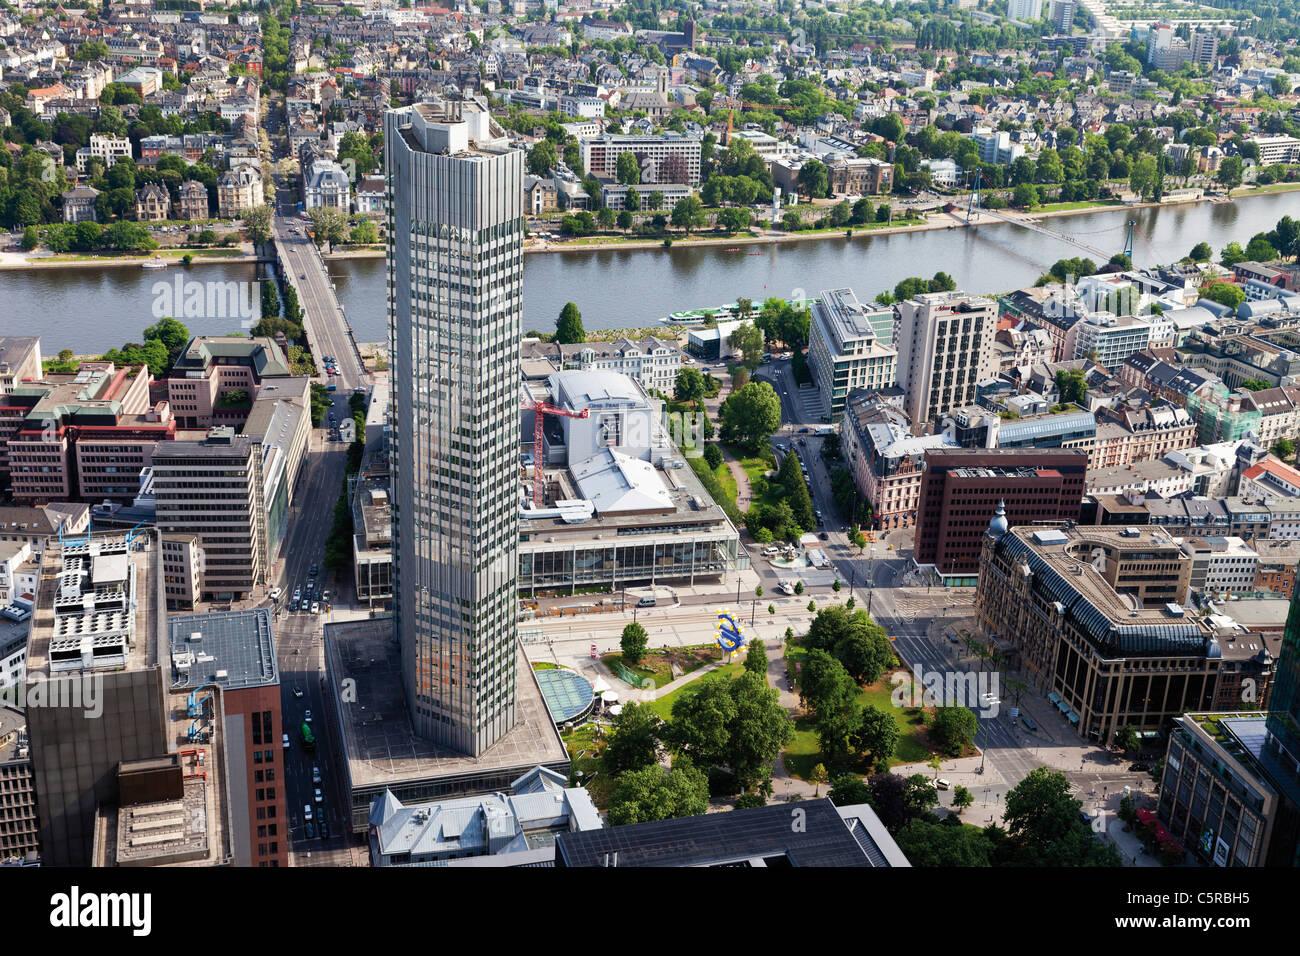 L'Europe, l'Allemagne, Hesse, Francfort, Avis de Banque centrale européenne Photo Stock